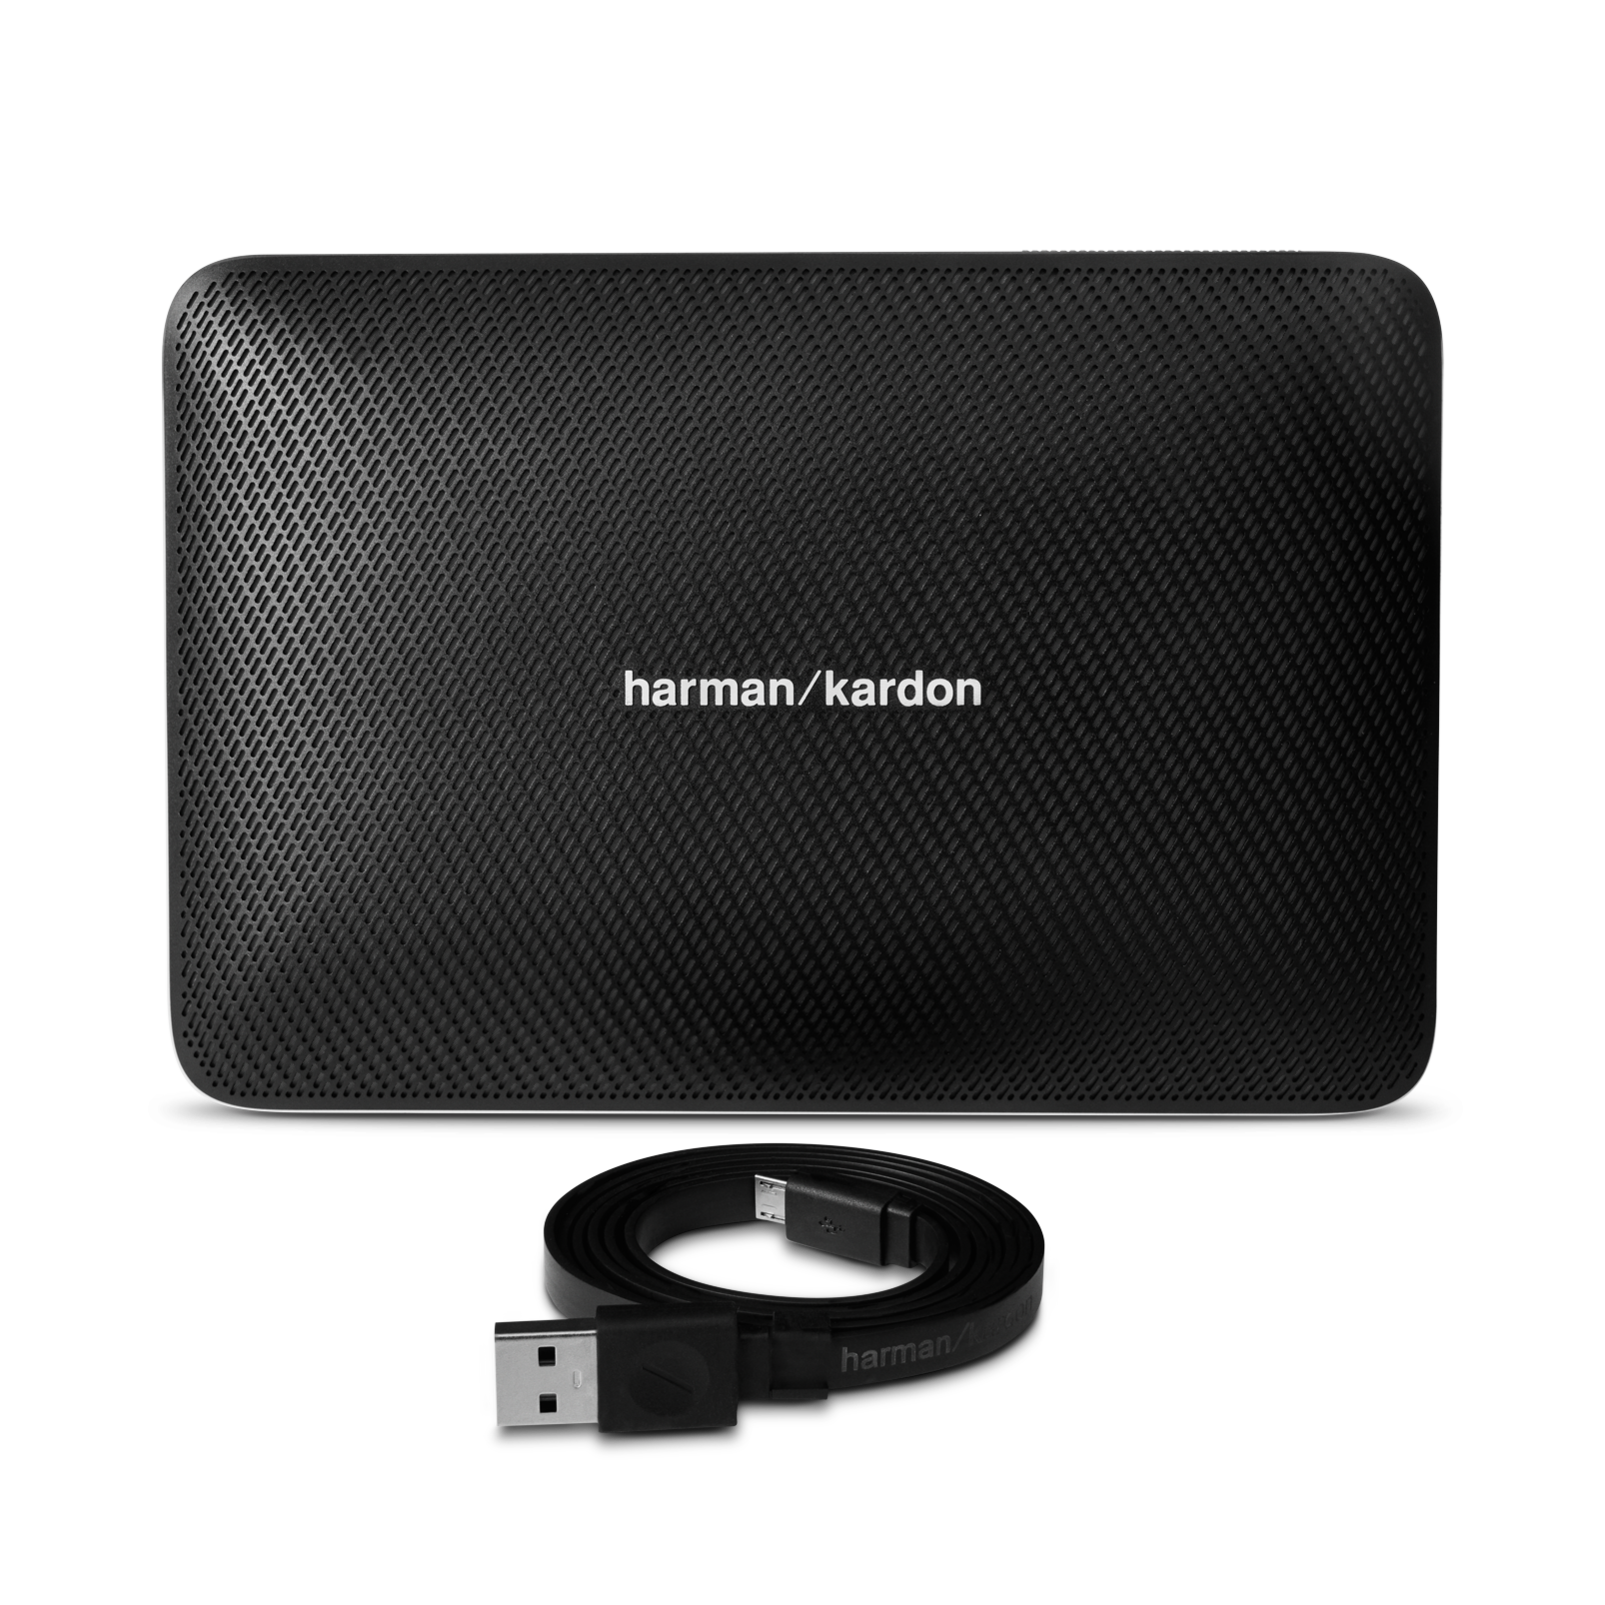 Esquire 2 - Black - Premium portable Bluetooth speaker with quad microphone conferencing system - Detailshot 1